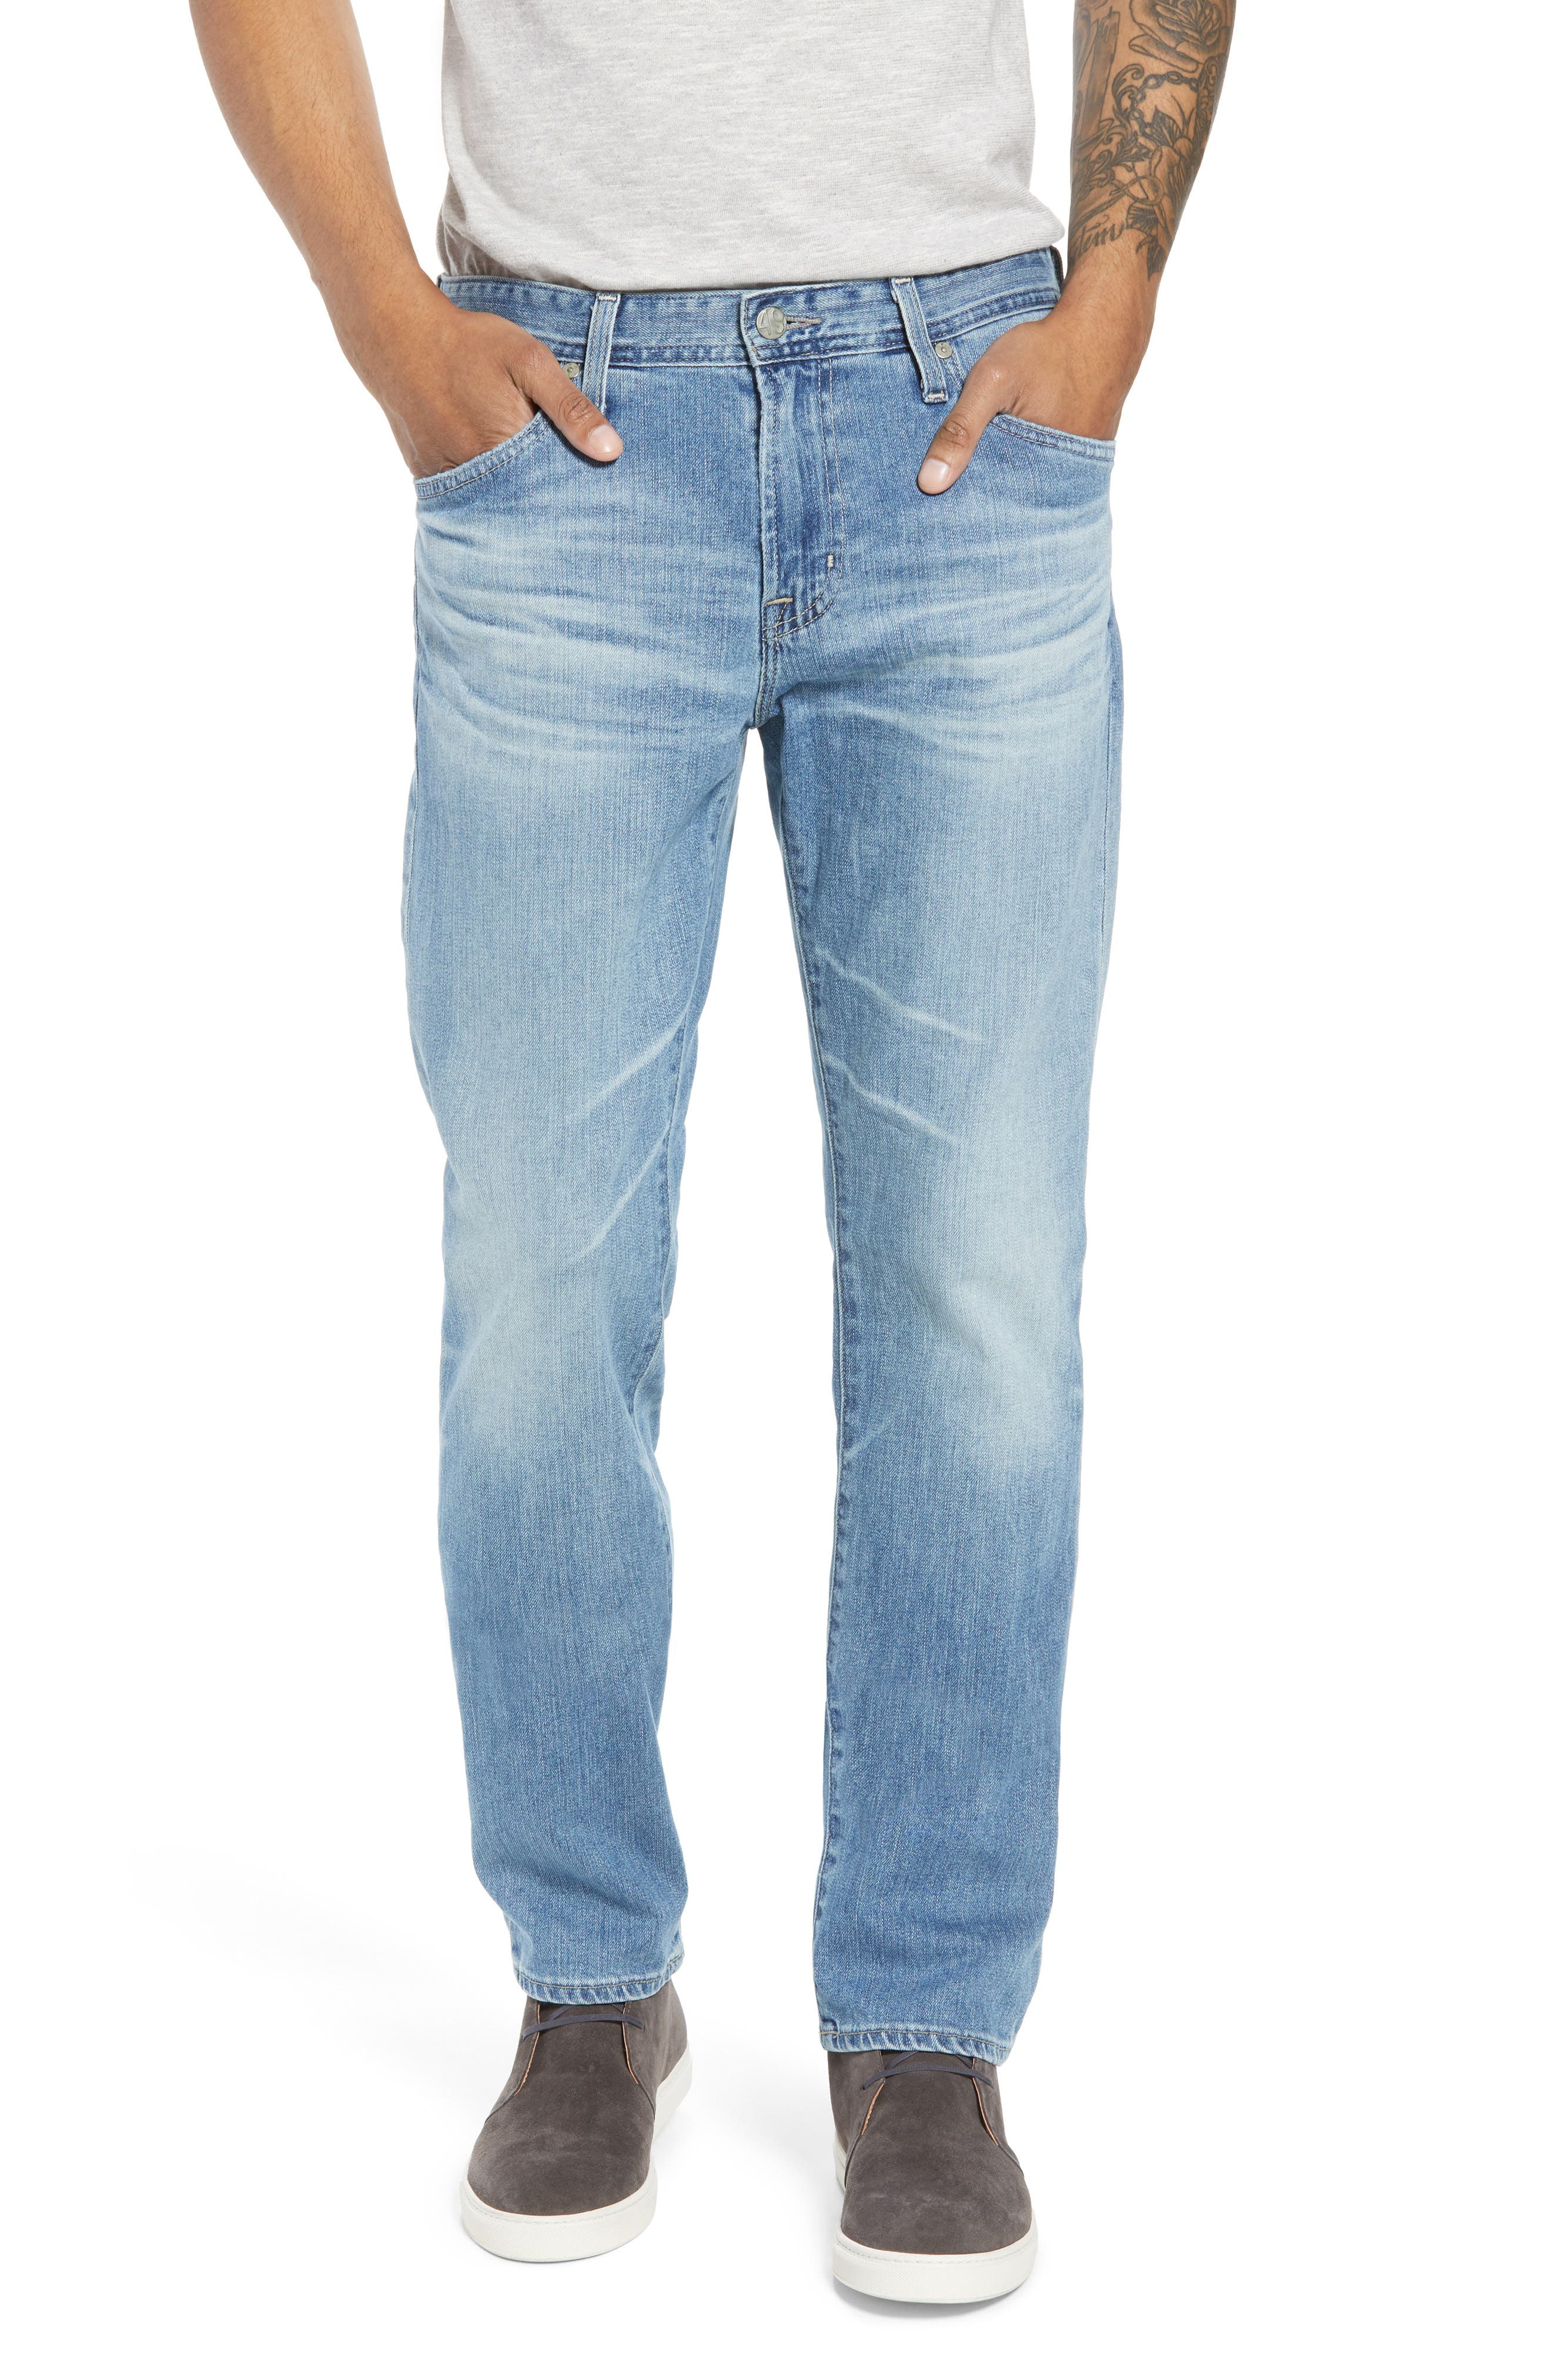 Everett Slim Straight Fit Jeans,                             Main thumbnail 1, color,                             18 Years Oceano